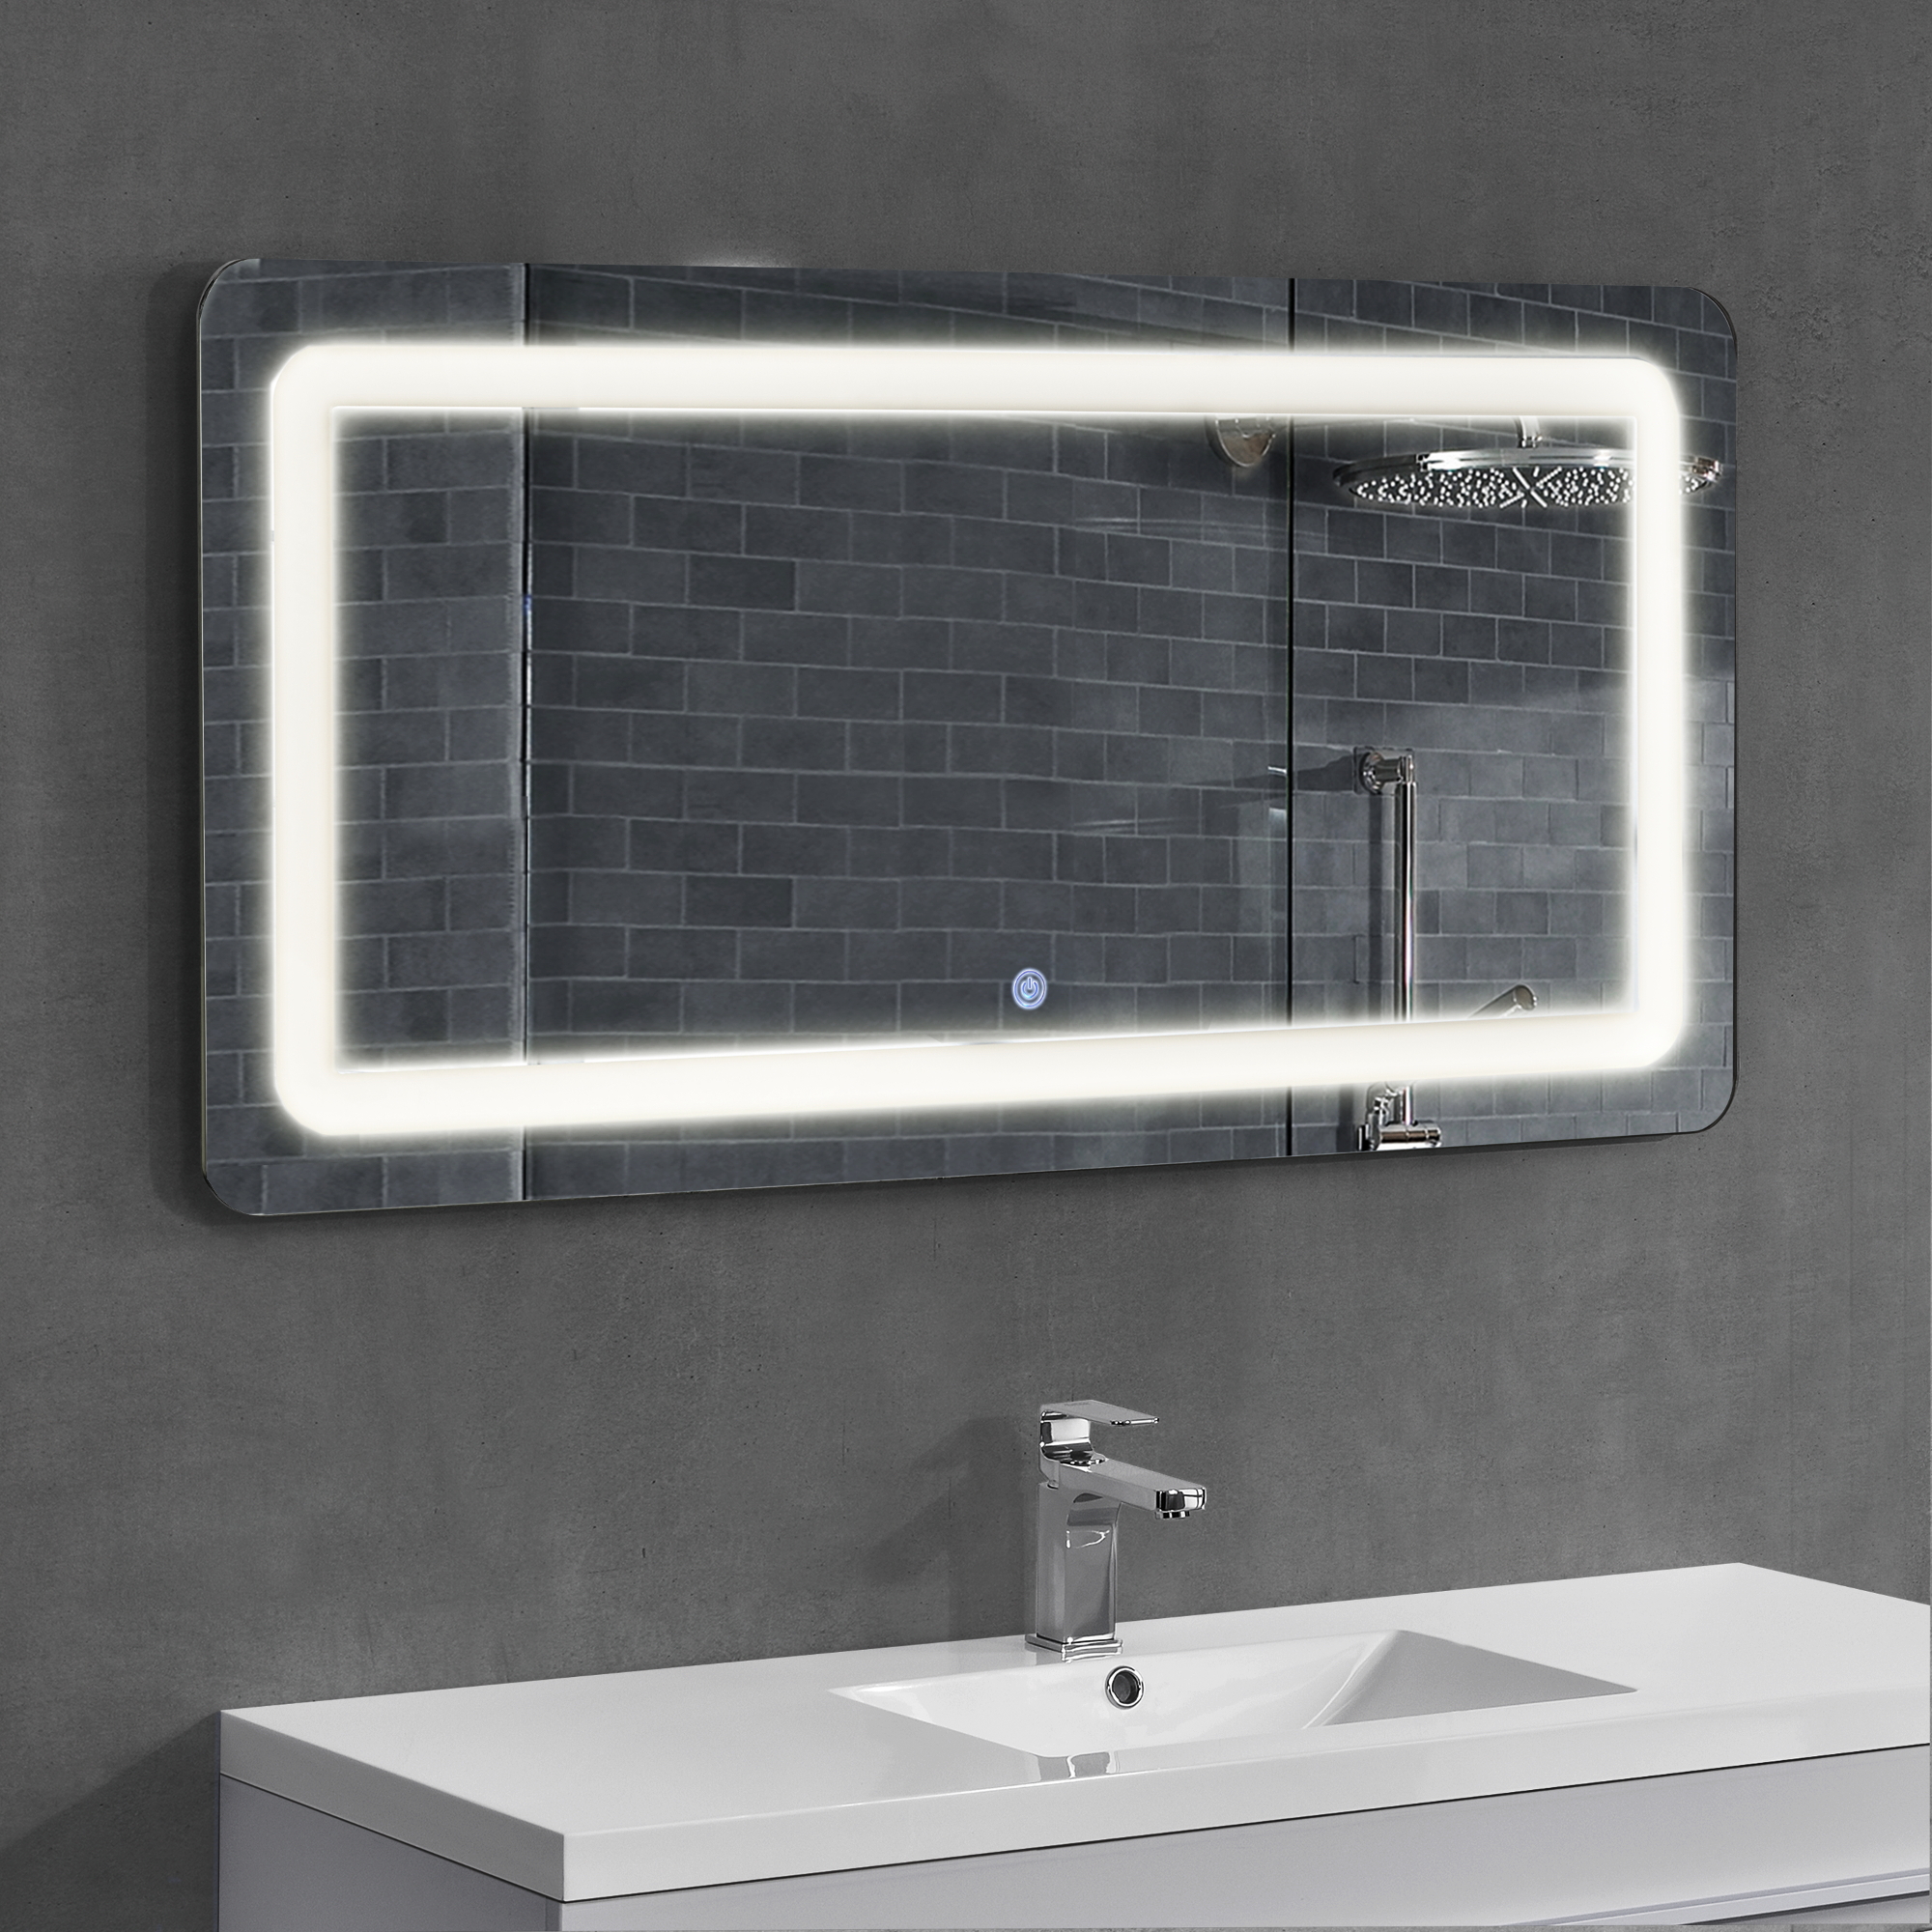 led badezimmerspiegel wandspiegel licht spiegel design 50 x 70 cm ebay. Black Bedroom Furniture Sets. Home Design Ideas